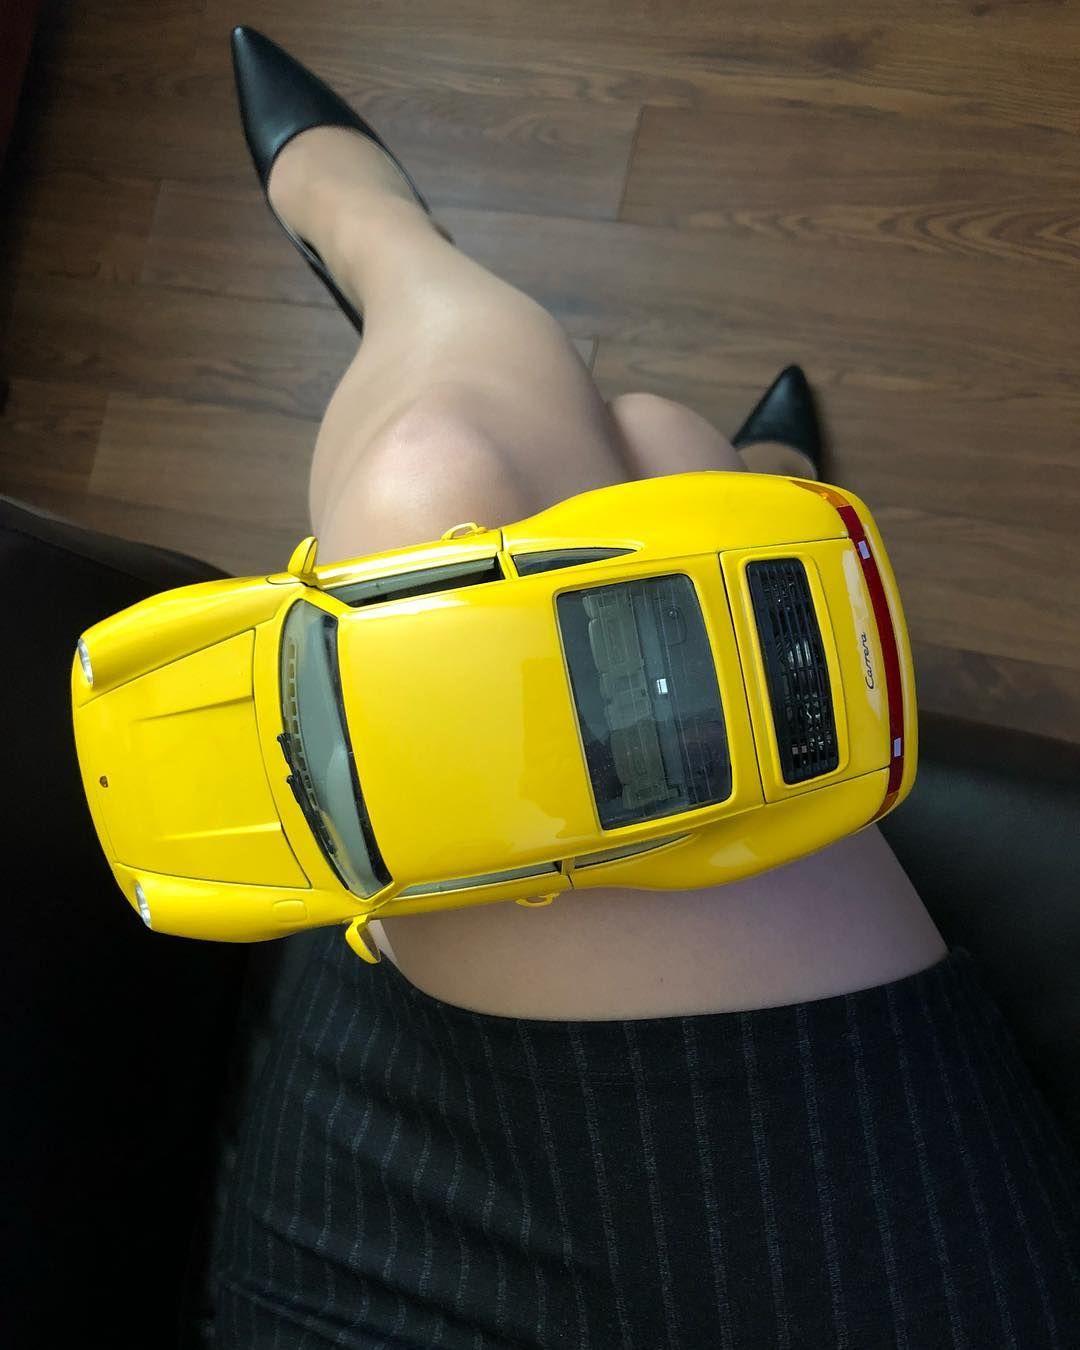 Beautiful yellow 1/18 scale Porsche Carrera 911, made in Italy by Bburago (1993). #awsome #yellow #diecast #porsche #911 #carrera #bburago #italy #sexy #car #legs #heels #nylon #stockings #feet #fast #diecastcars #diecastindonesia #hotwheels #rubber #tires #wheels #toyphotography #collection #hobby #toycommunity #sutomotive #porsche911 #collector @bburago_collezione @porsche